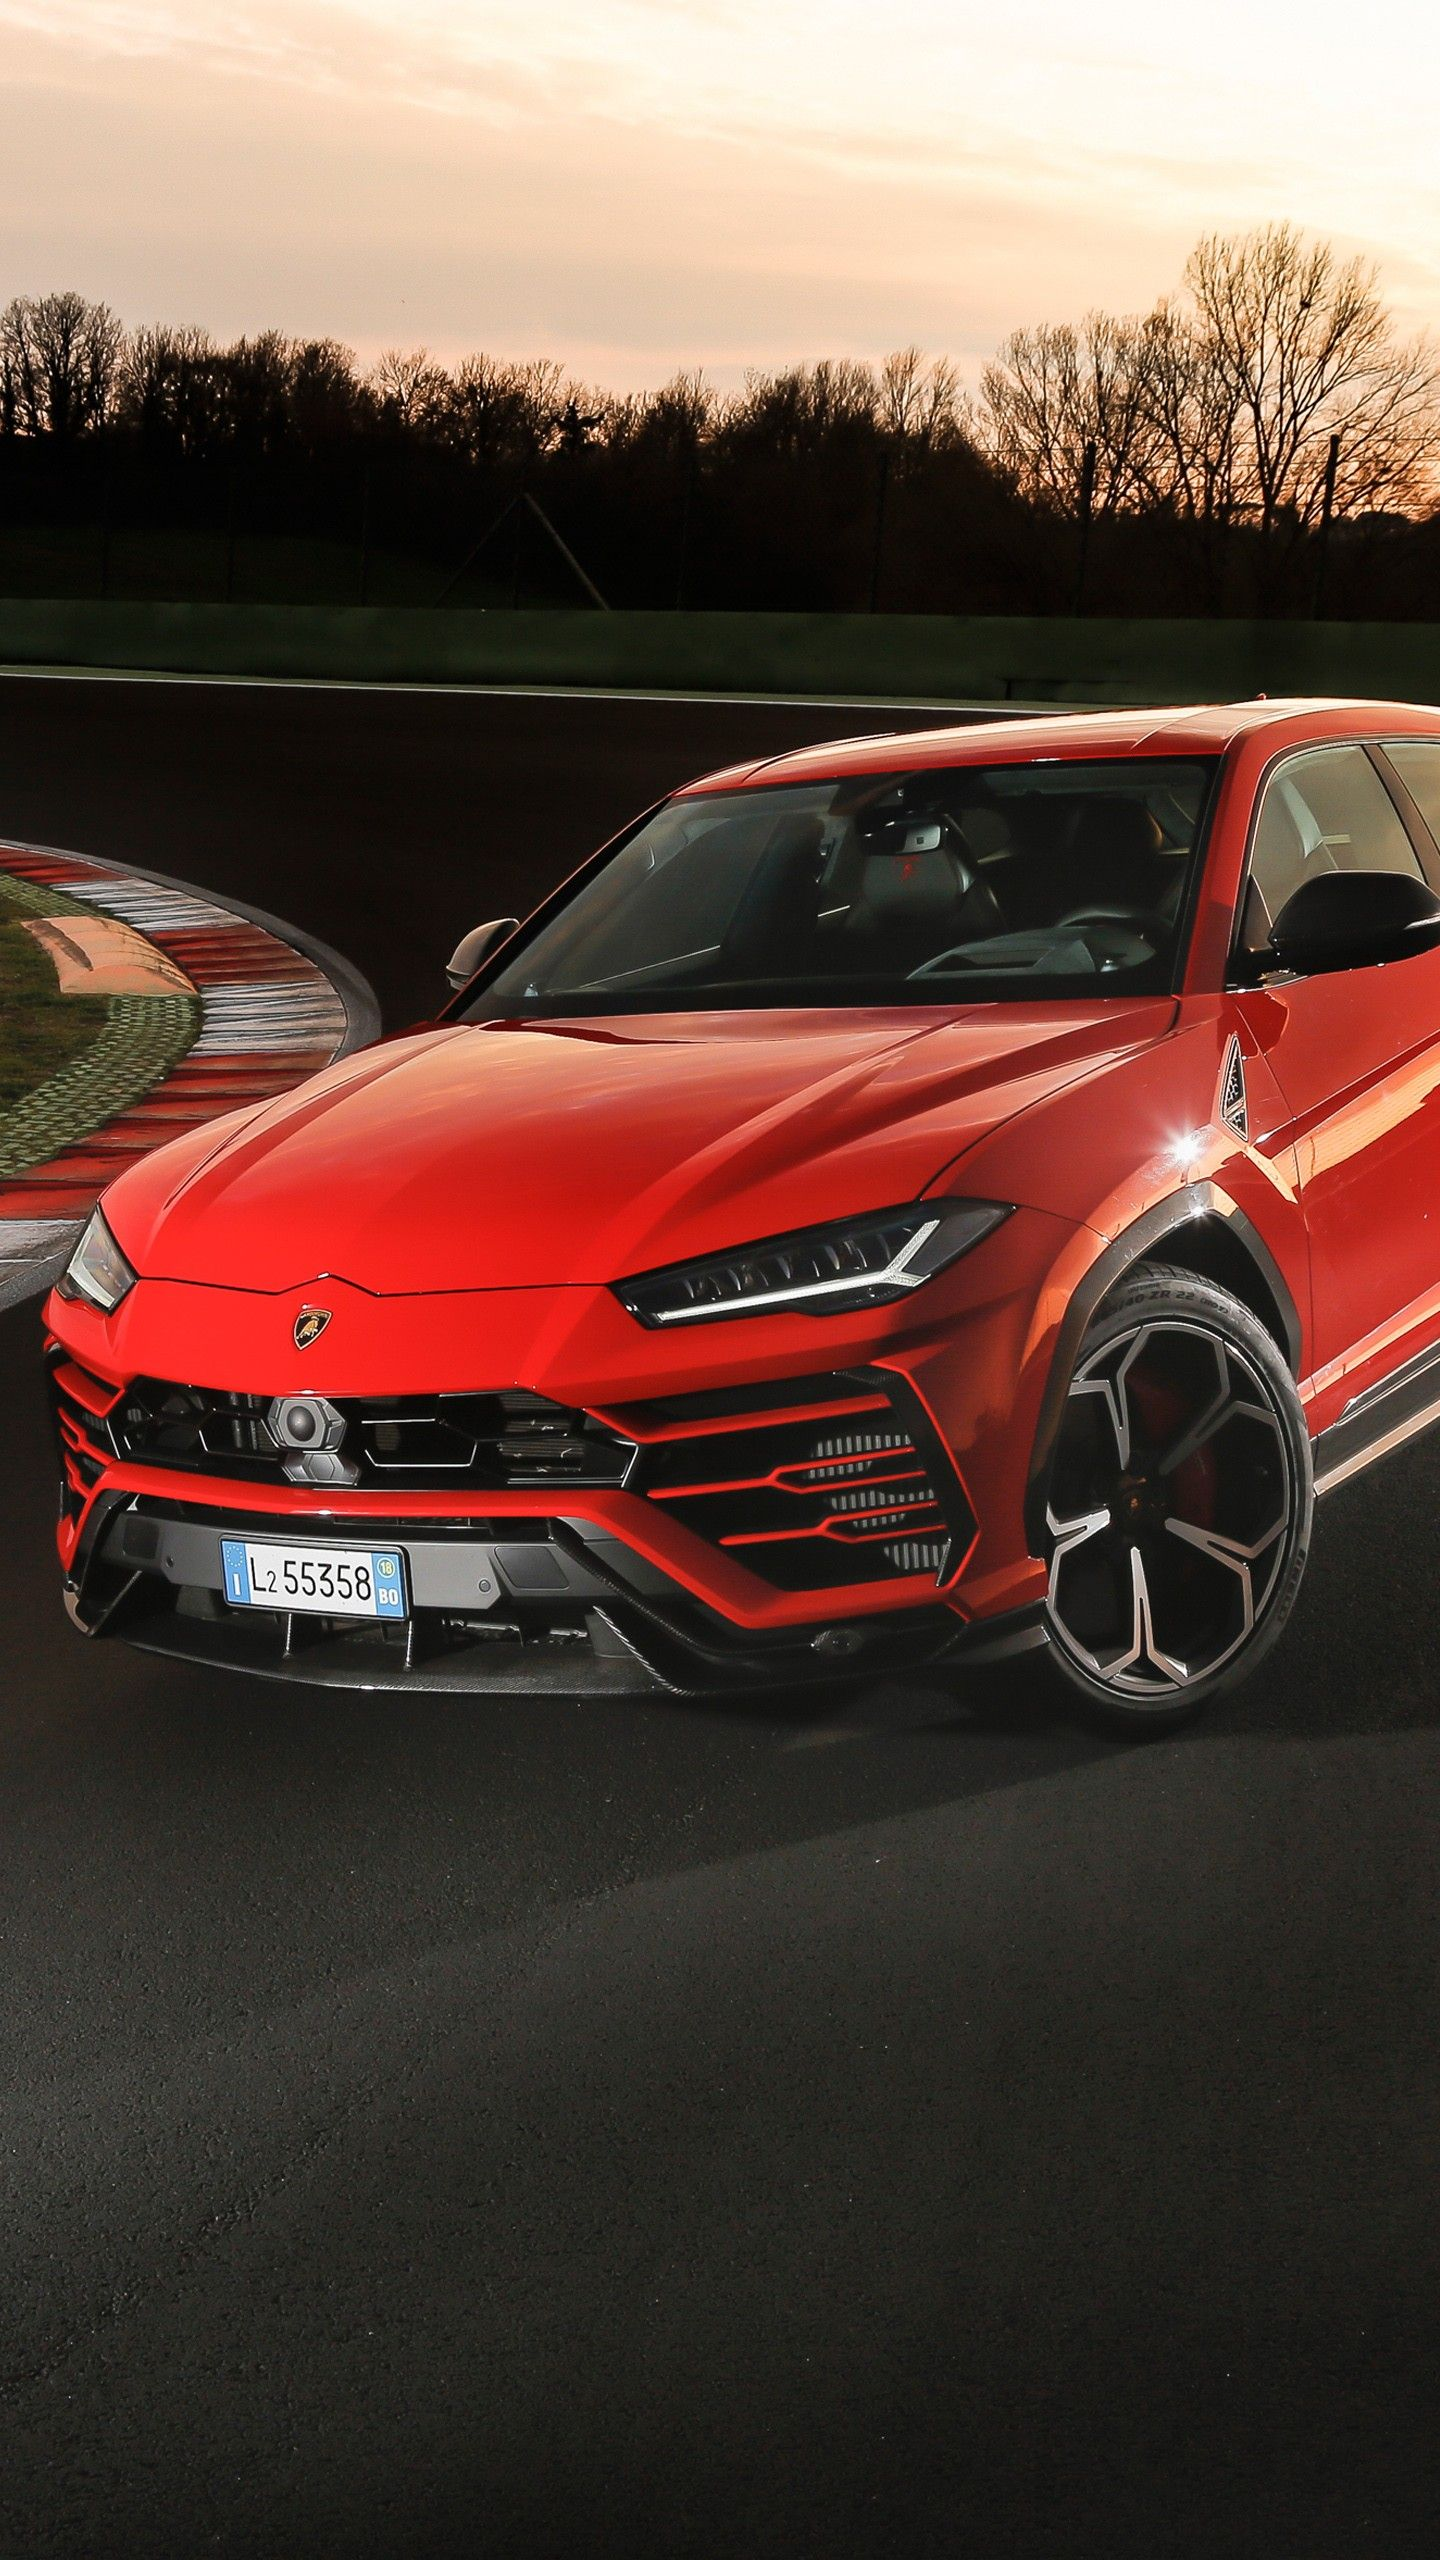 Cars Lamborghini Urus Shiny Black Package 2018 4k Wallpapers